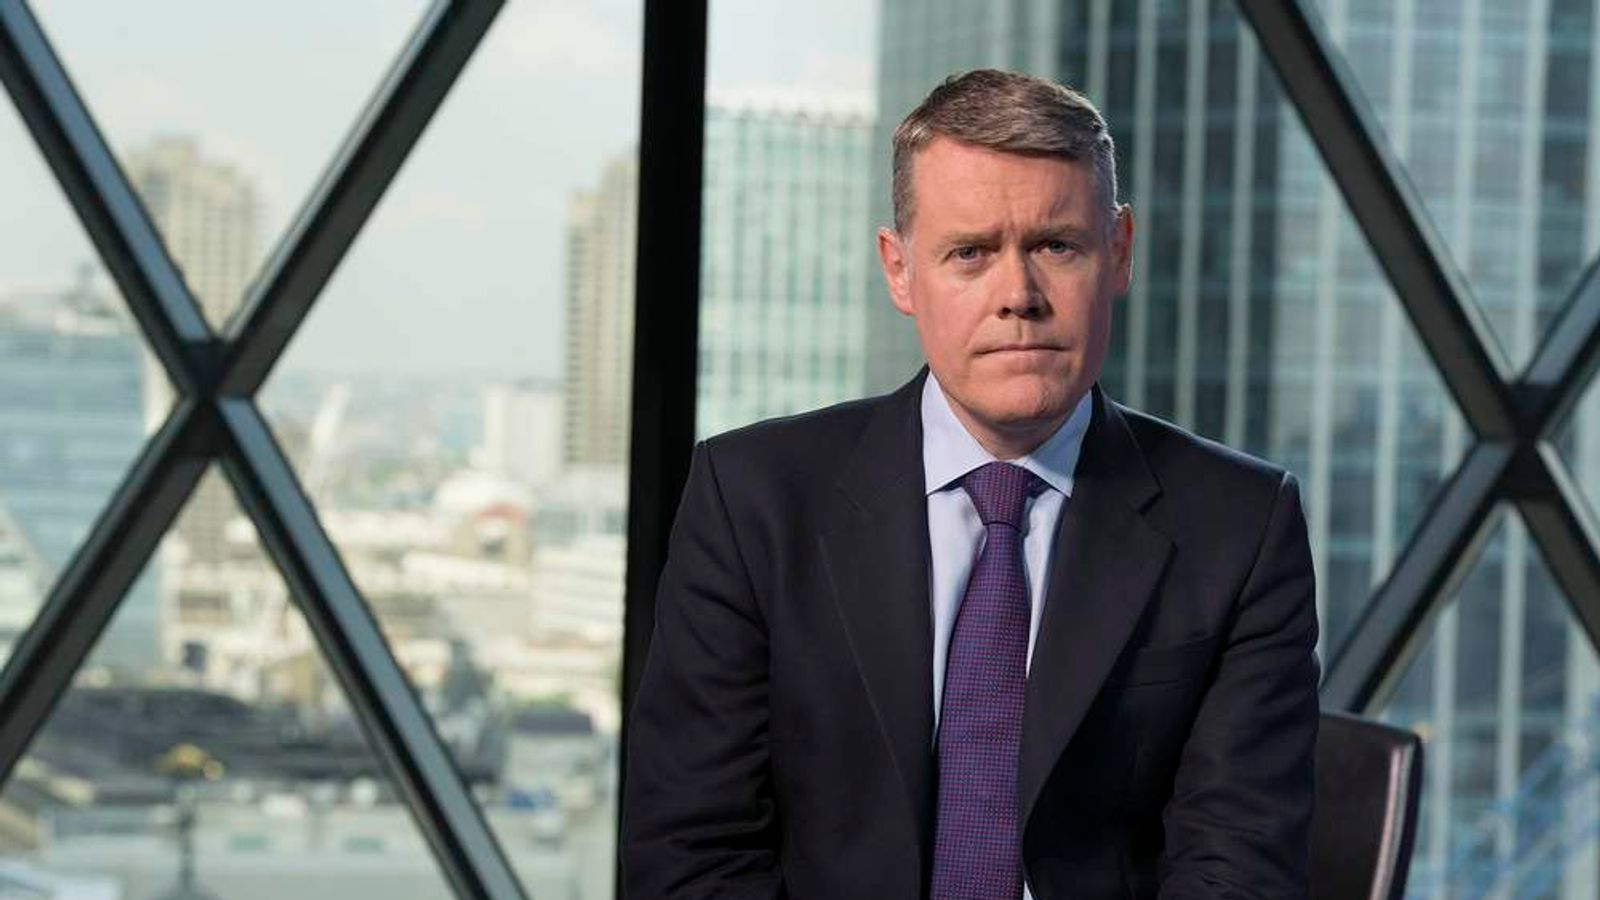 Ian King, Sky News Business Presenter